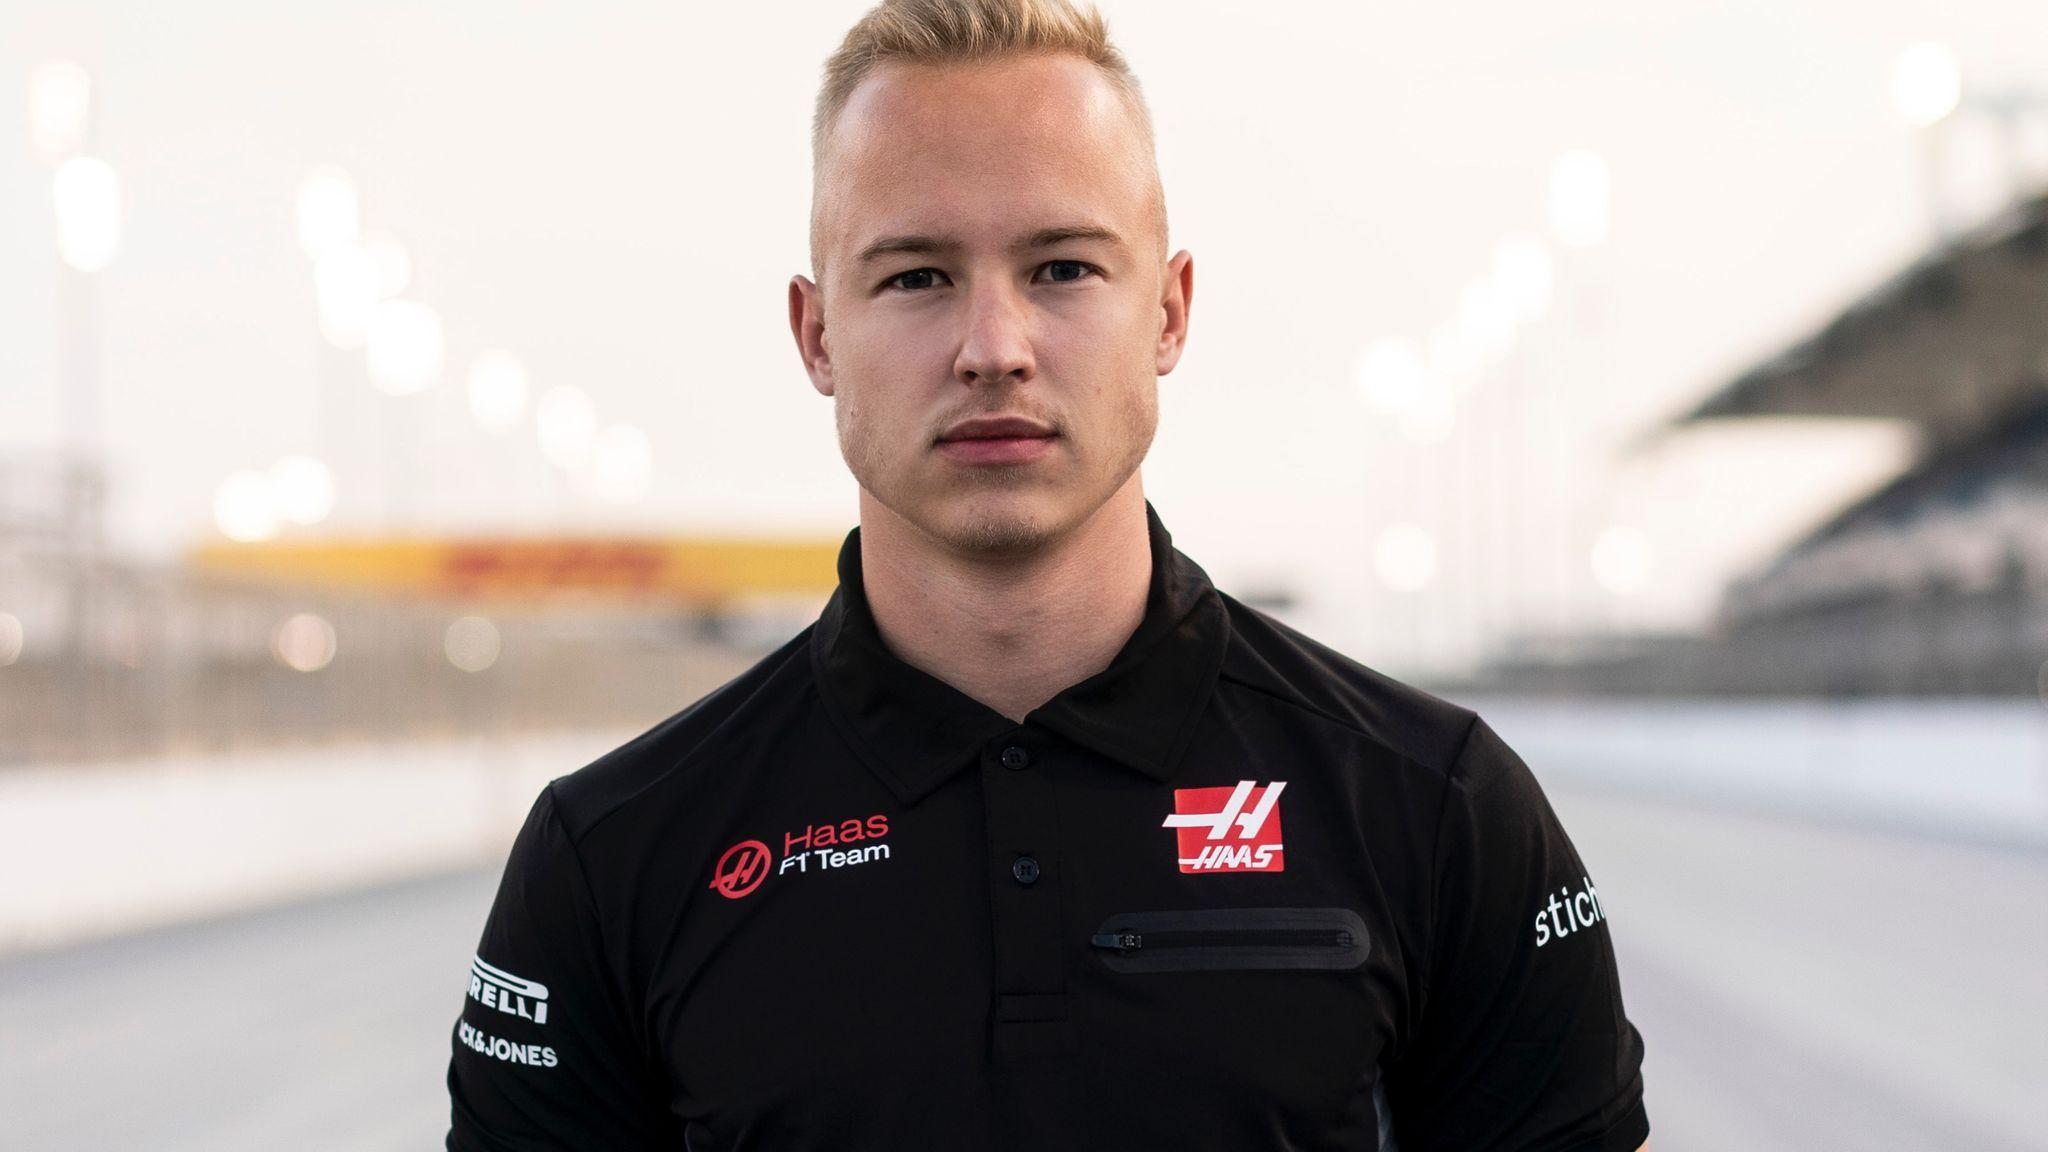 Nikita Mazepin to start P23 due to grid drop